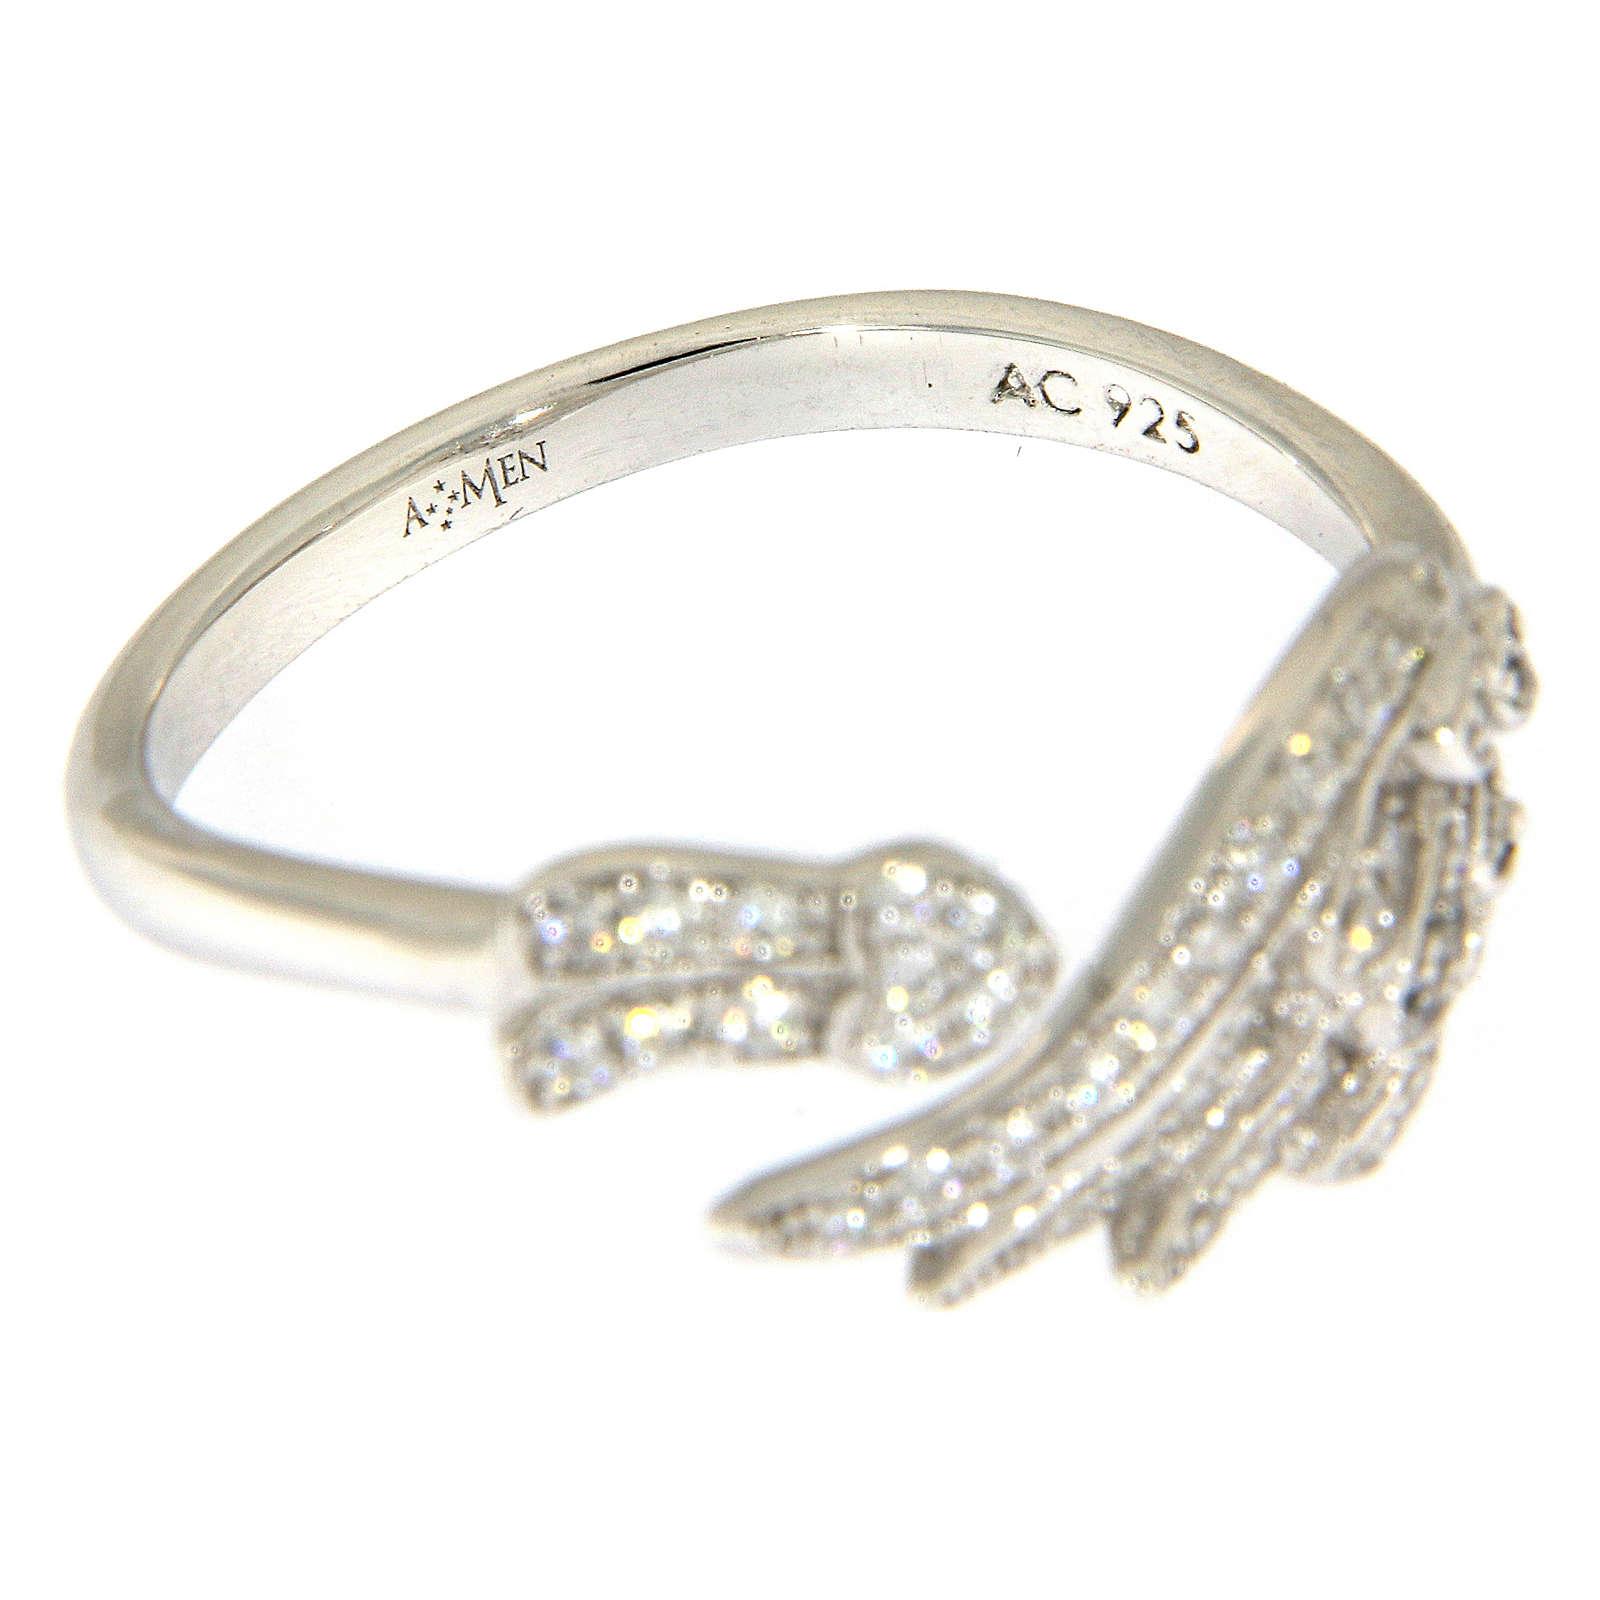 Anello AMEN ala argento 925 e zirconi bianchi 3